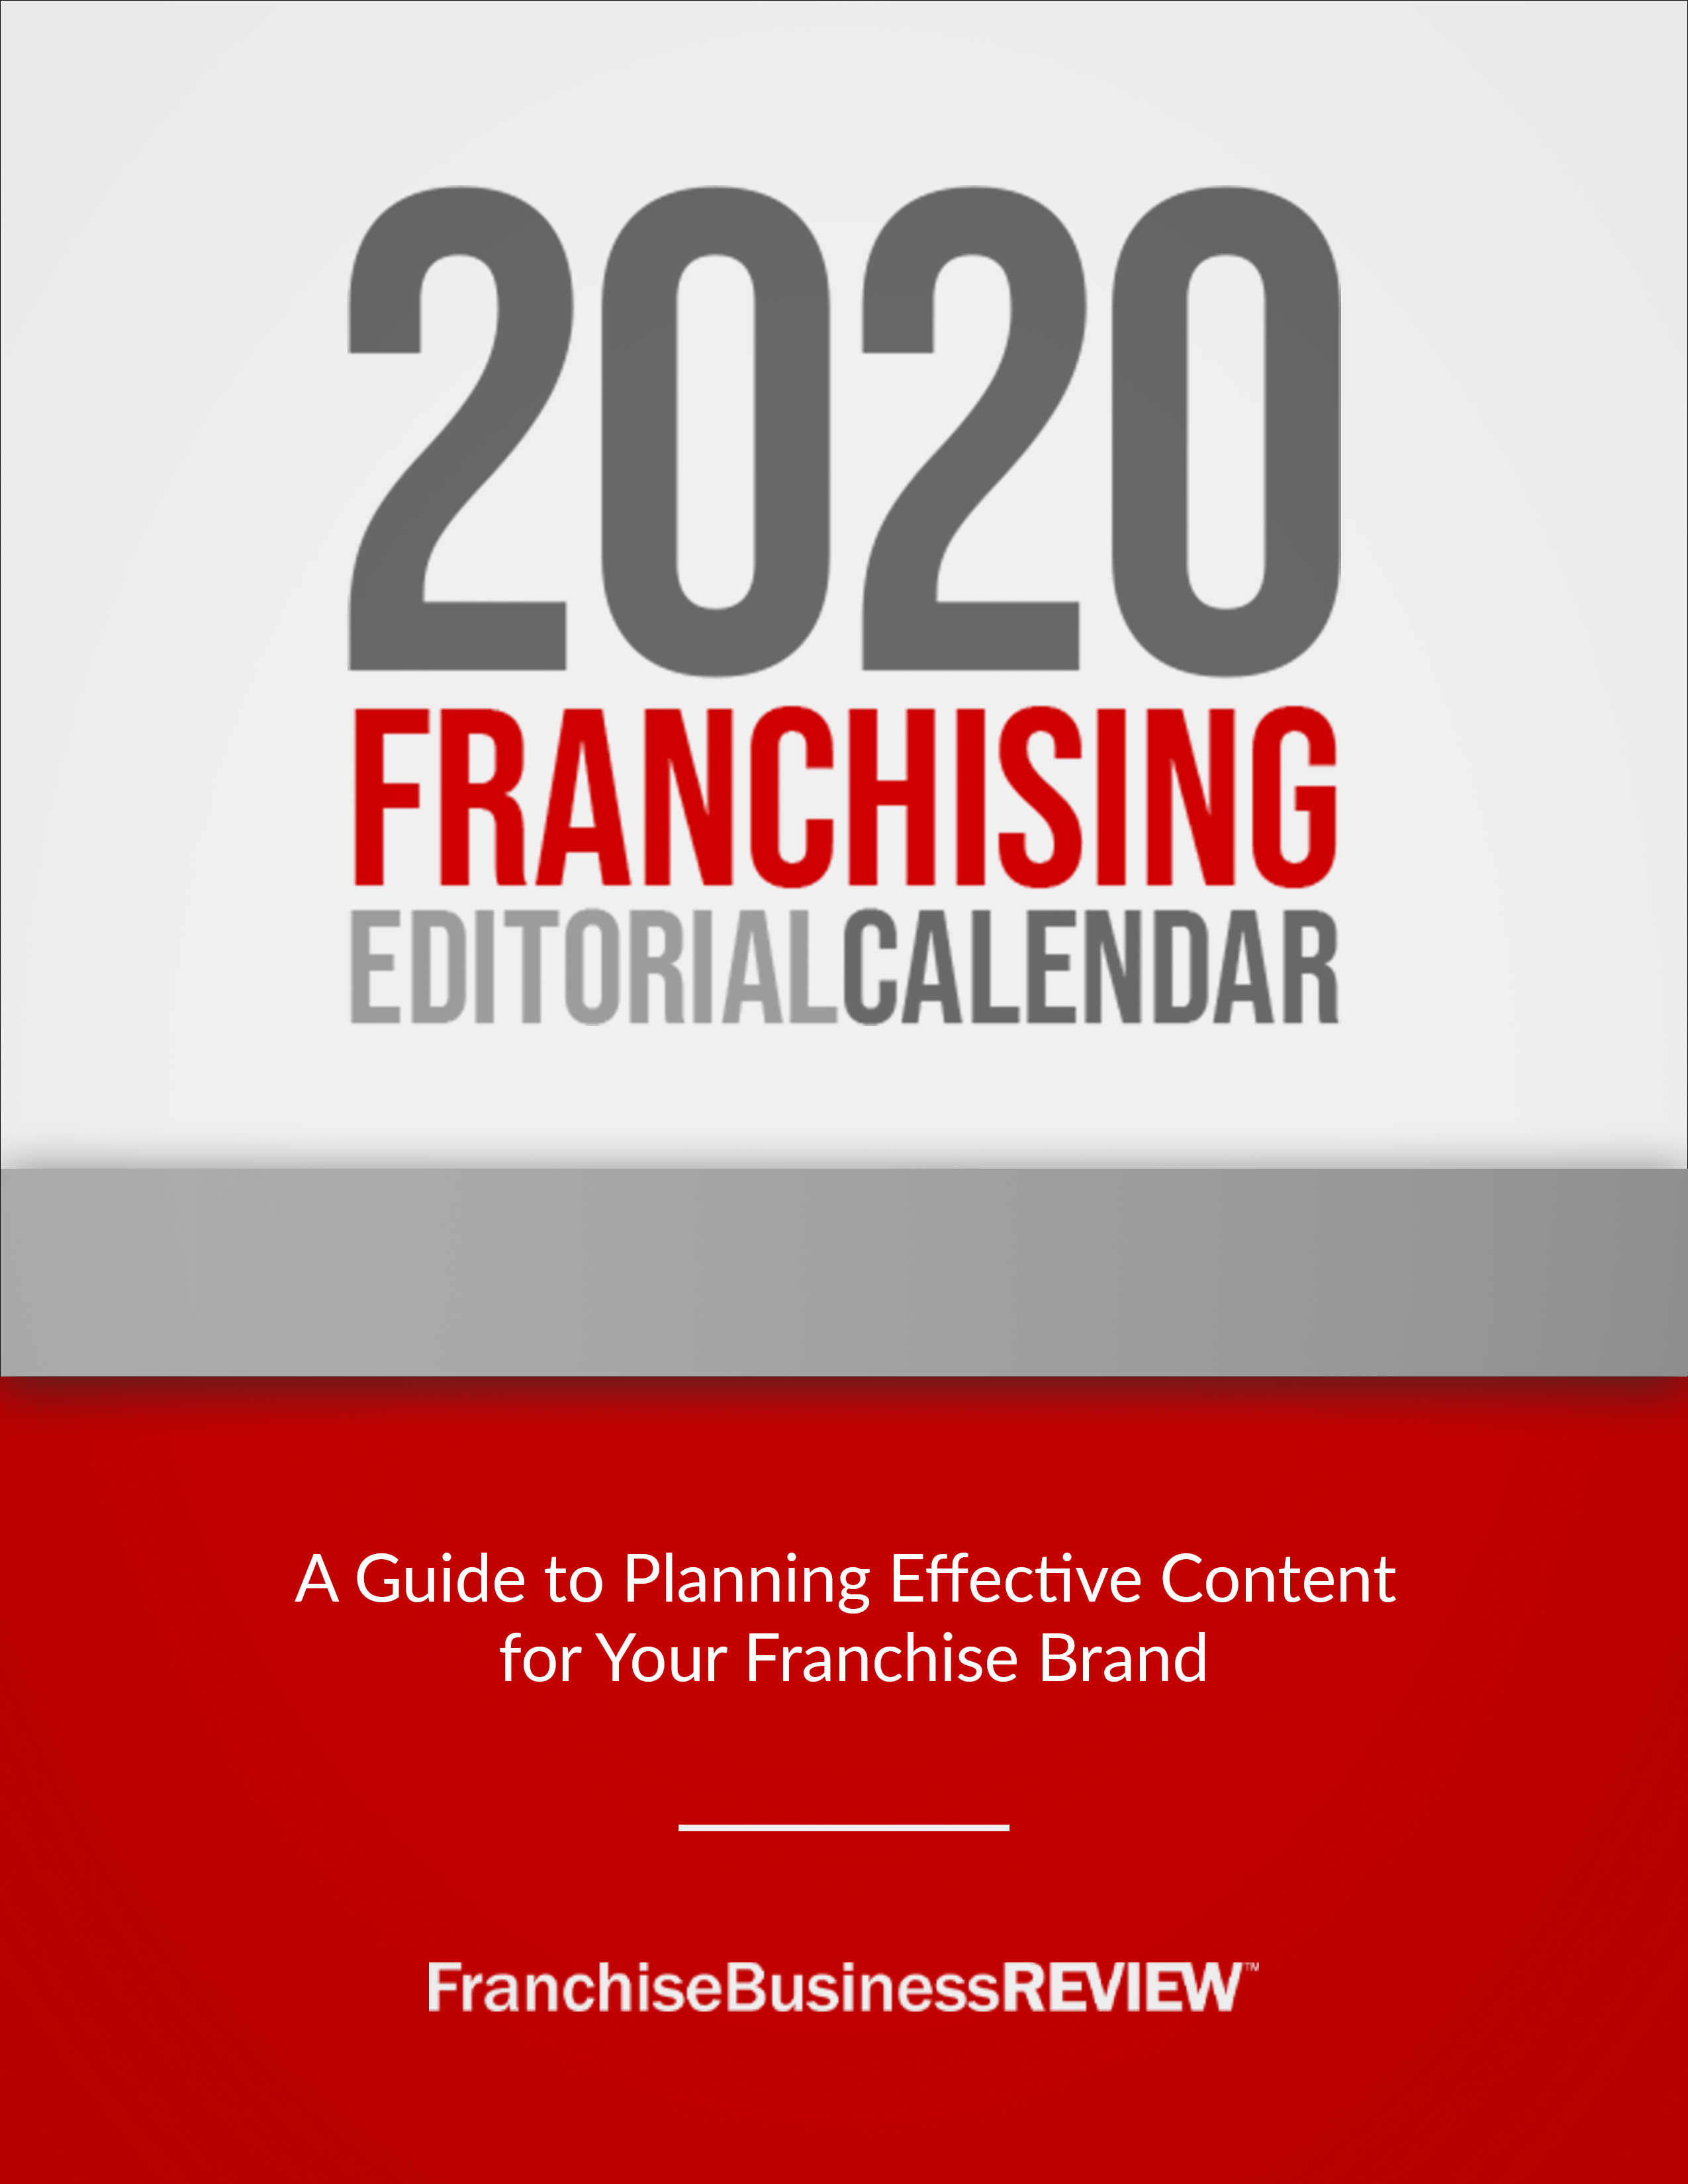 2020 Franchising Editorial Calendar